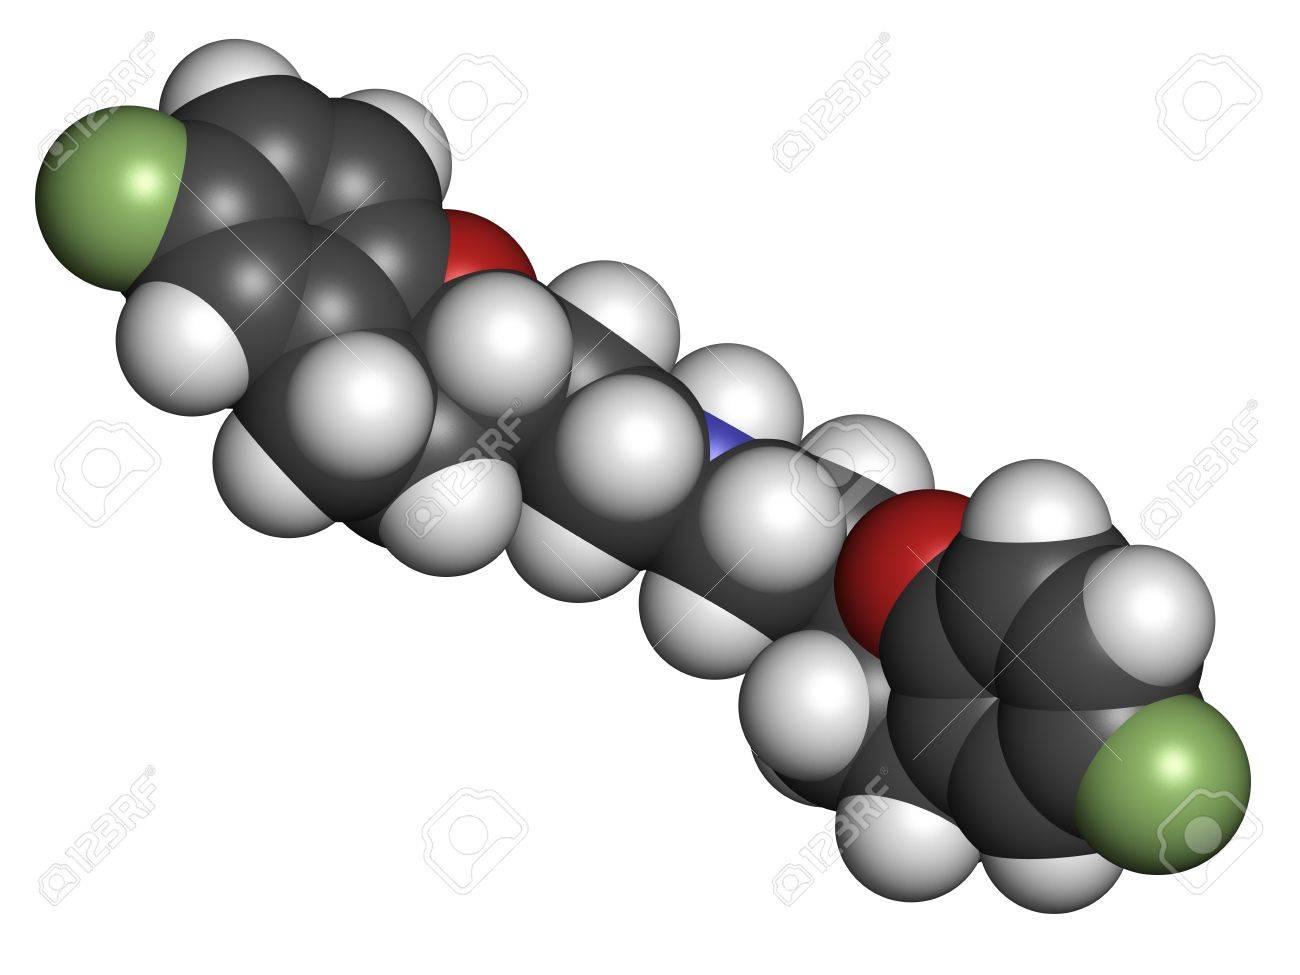 Colour therapy for high bp - Colour Therapy For High Blood Pressure Nebivolol Beta Blocker Drug Chemical Structure Used To Treat